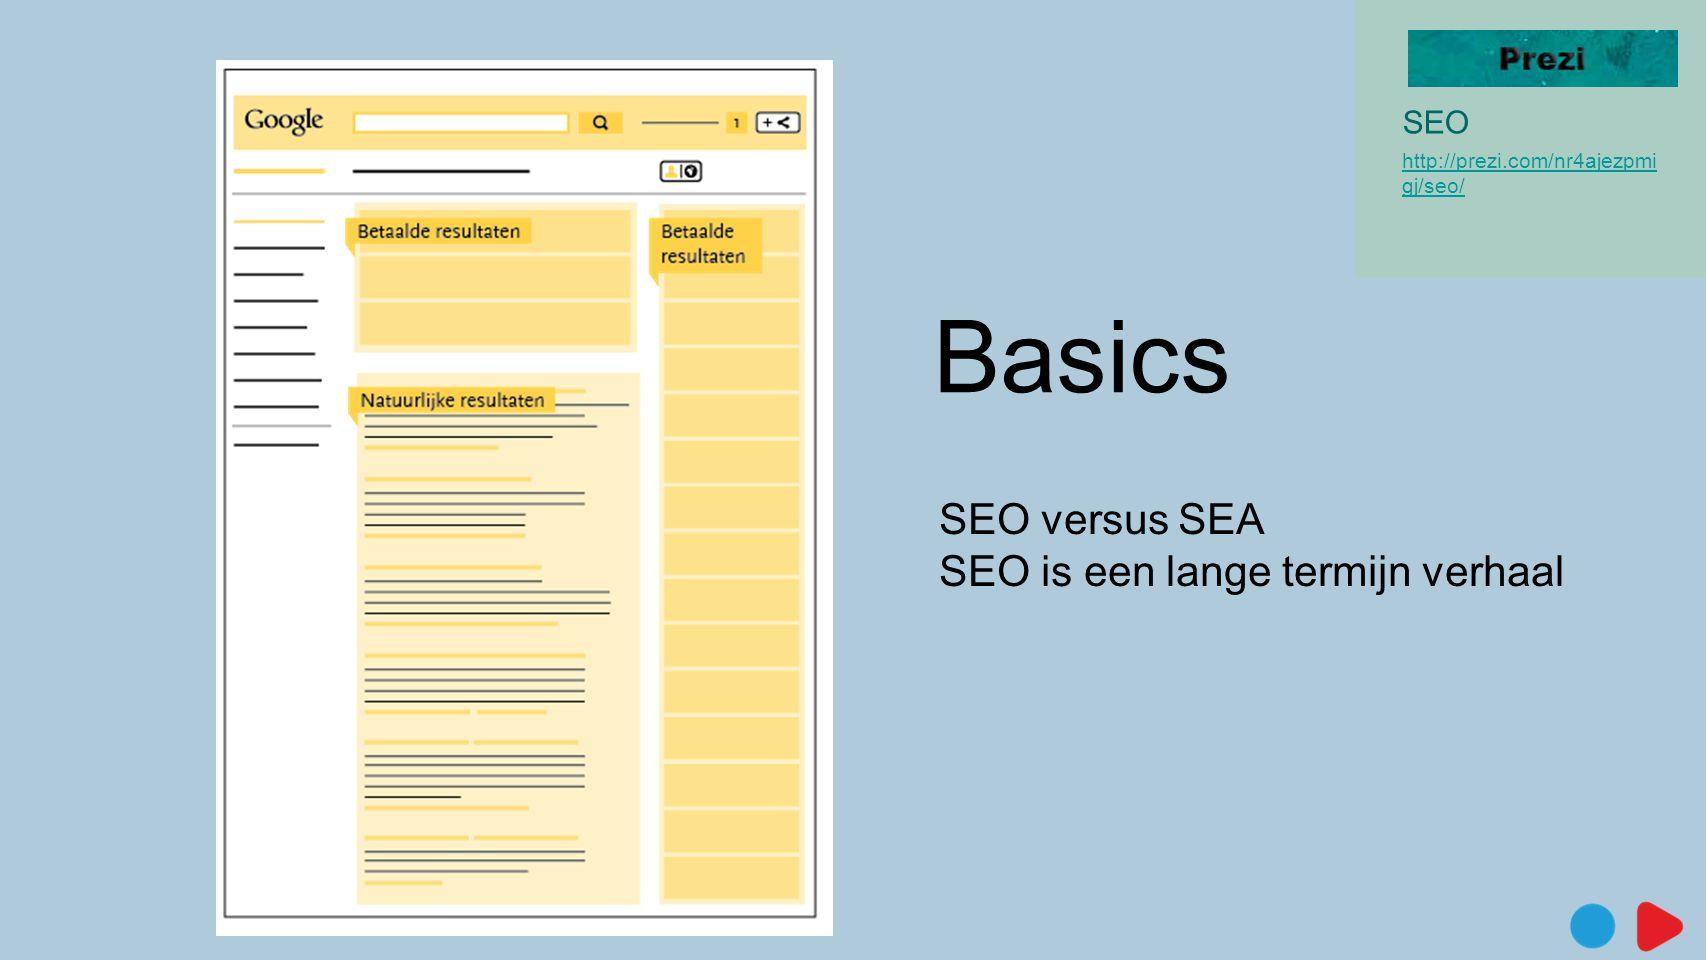 Basics SEO versus SEA SEO is een lange termijn verhaal SEO http://prezi.com/nr4ajezpmi gj/seo/